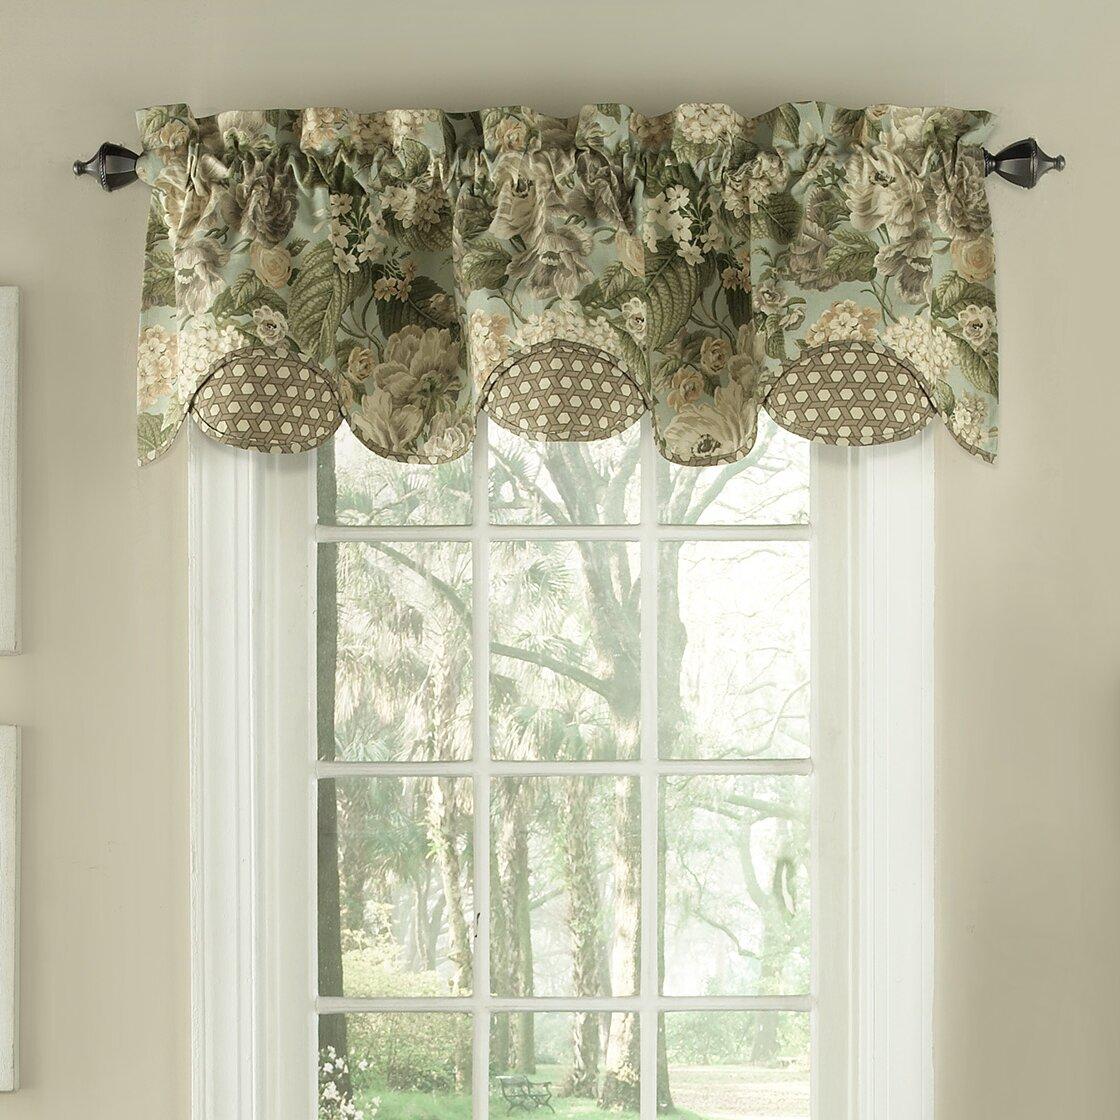 Waverly kitchen curtains - Garden Glory Scalloped Floral Curtain Valance